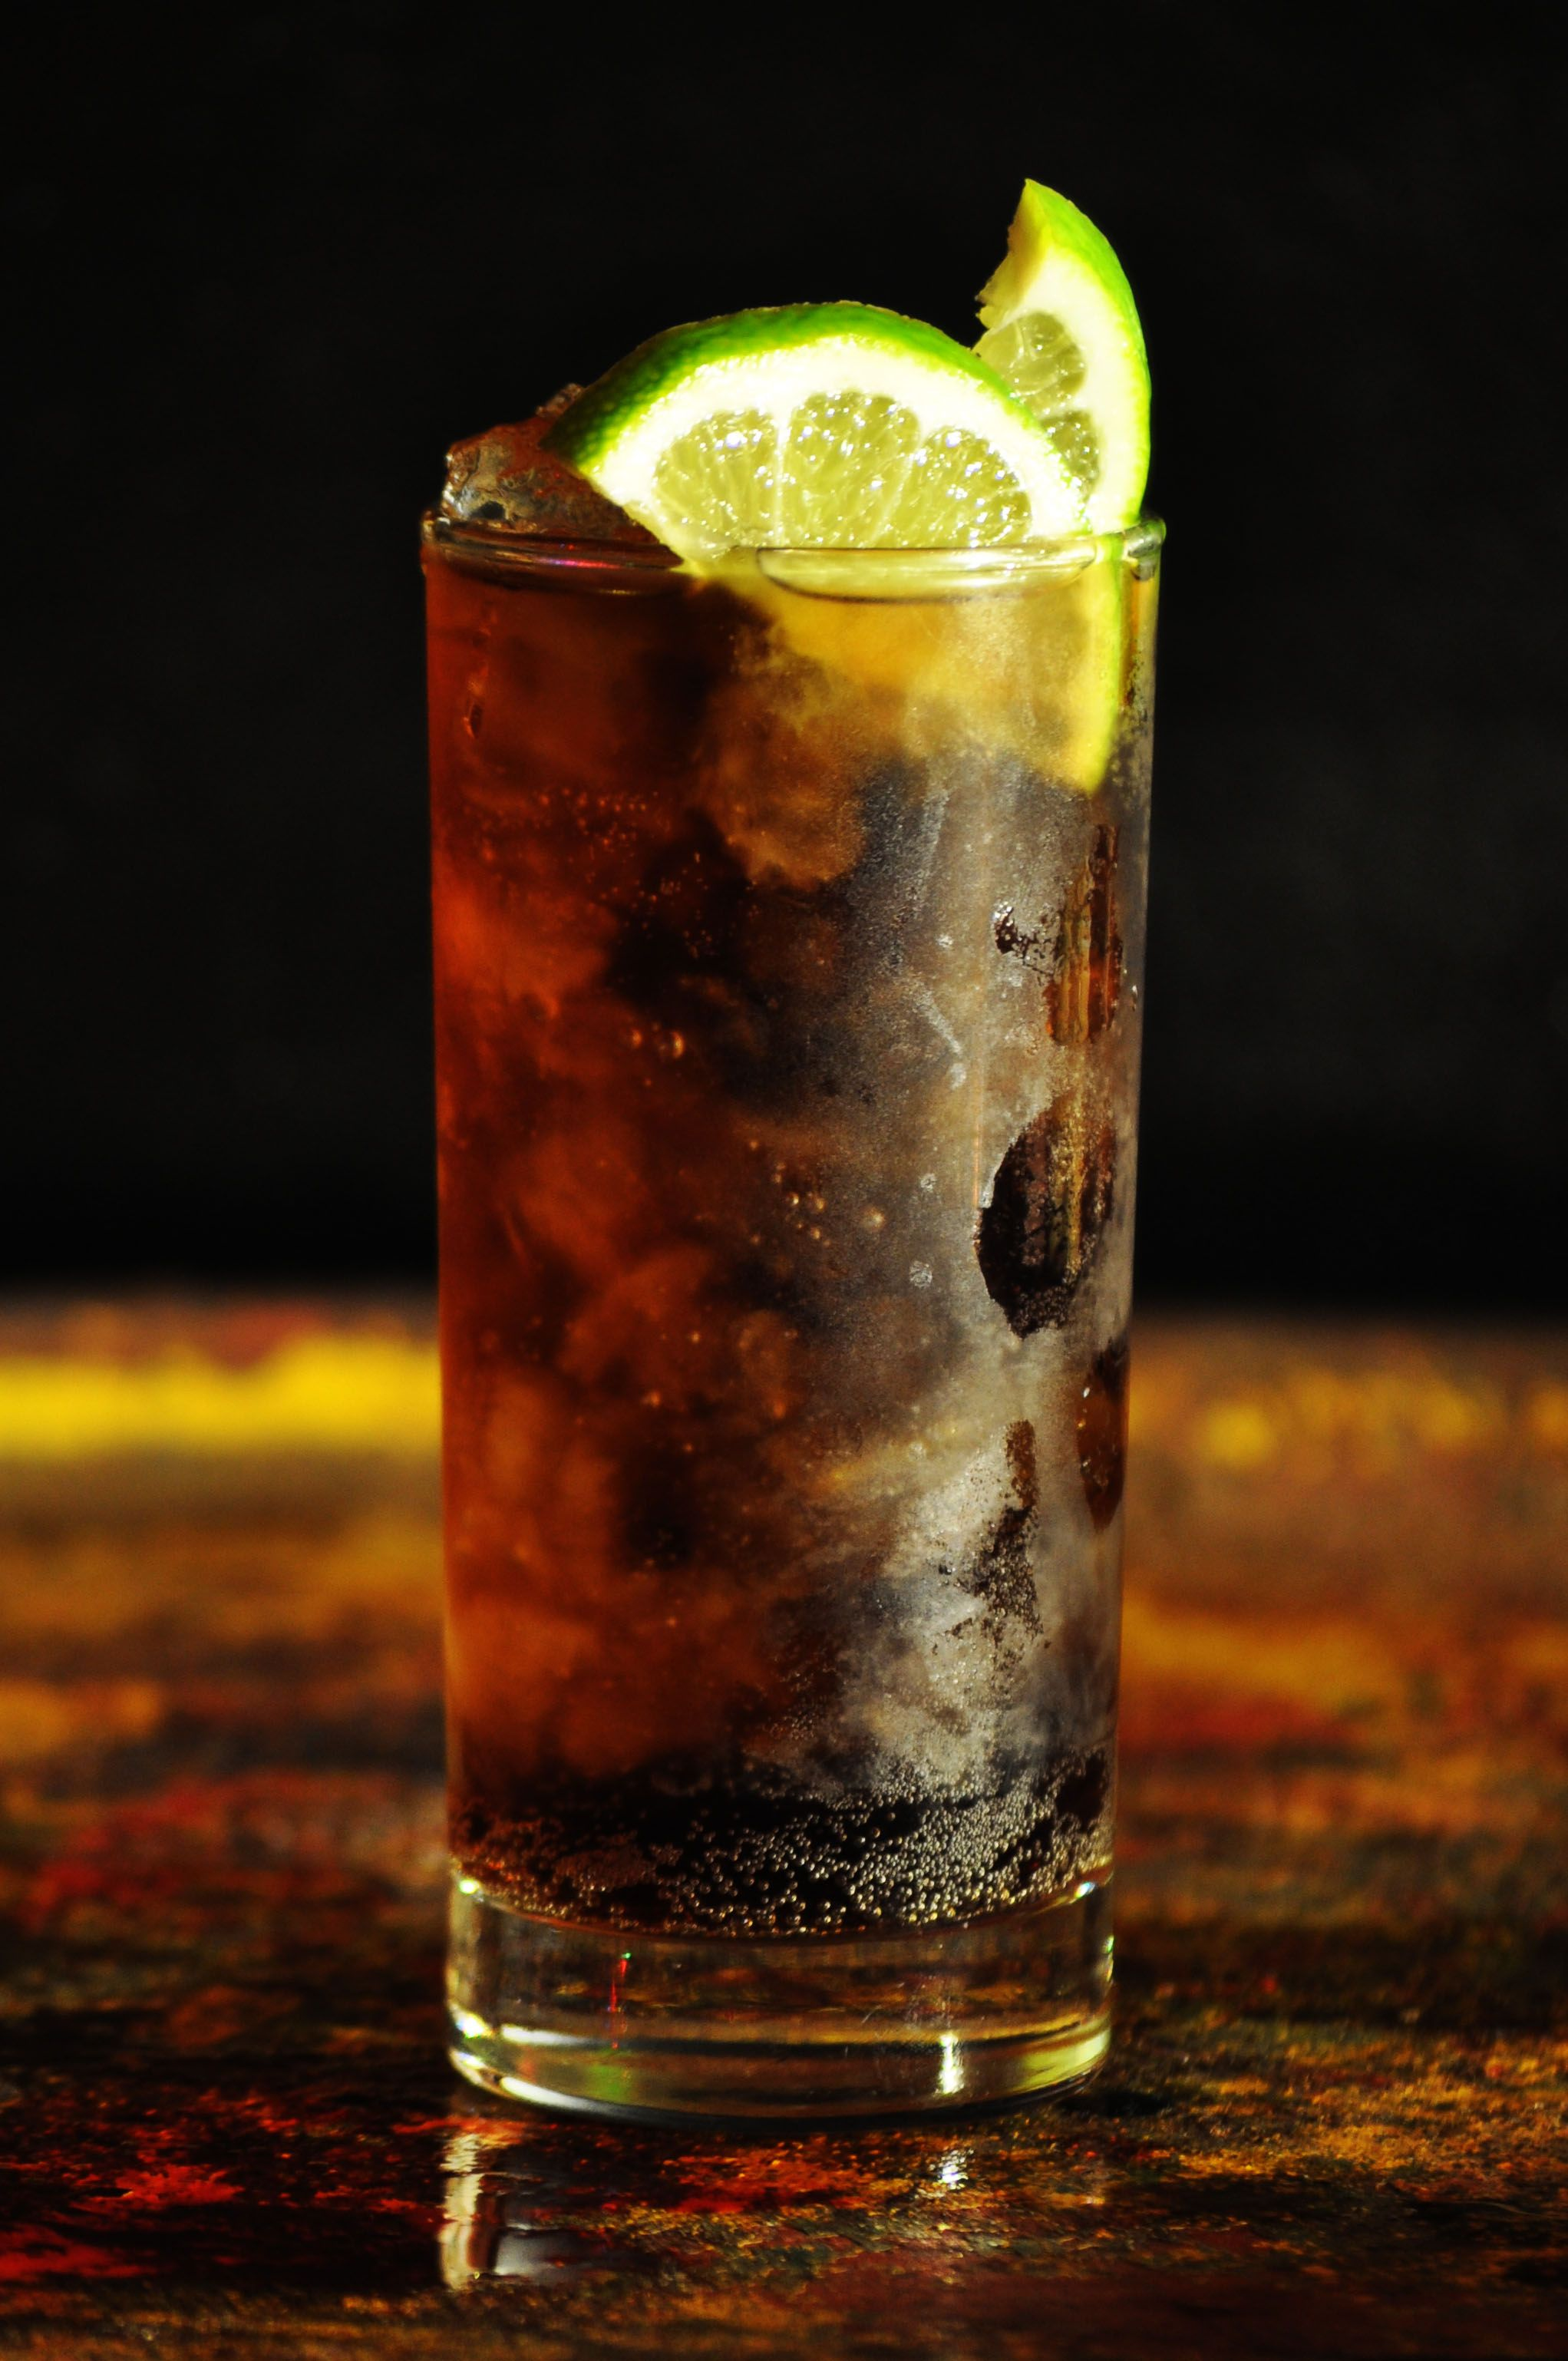 Inspiring Beliebte Cocktails Gallery Of Cuba Libre · Hochschulgetränkerum Cocktail Rezepteberühmte Cocktailsbeliebte